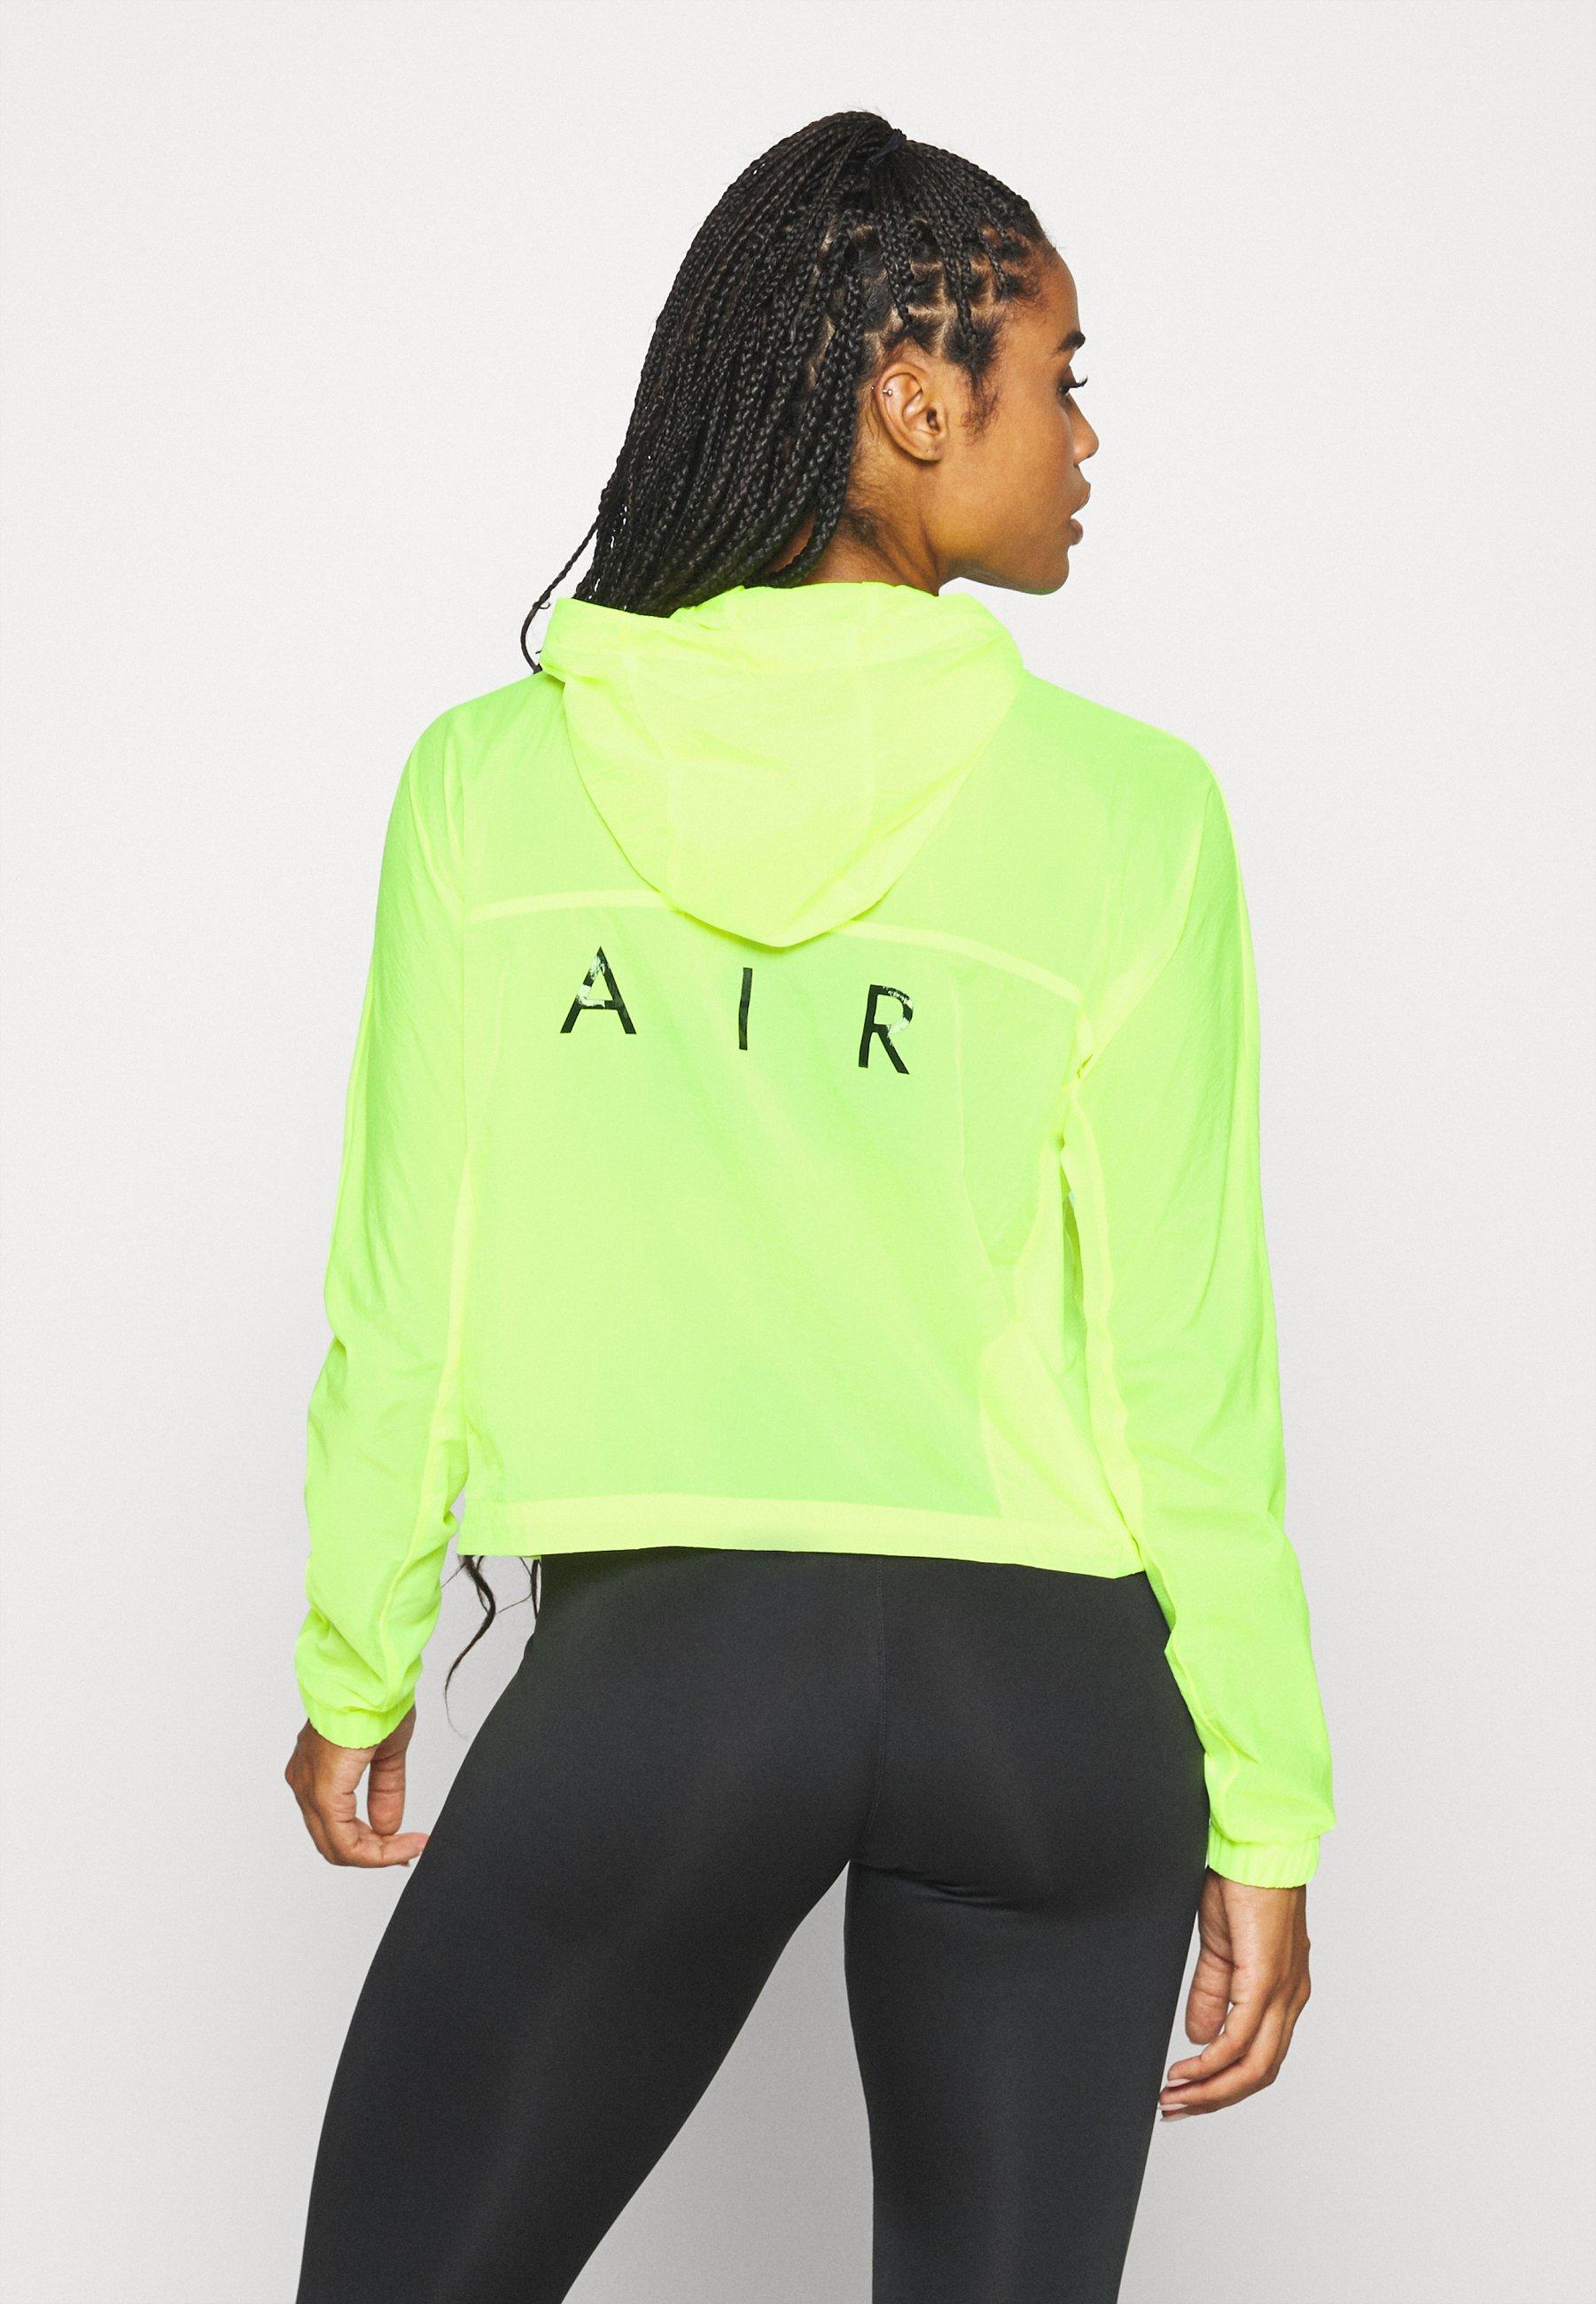 Ultimo sconto Abbigliamento da donna Nike Performance AIR Giacca da corsa volt/black